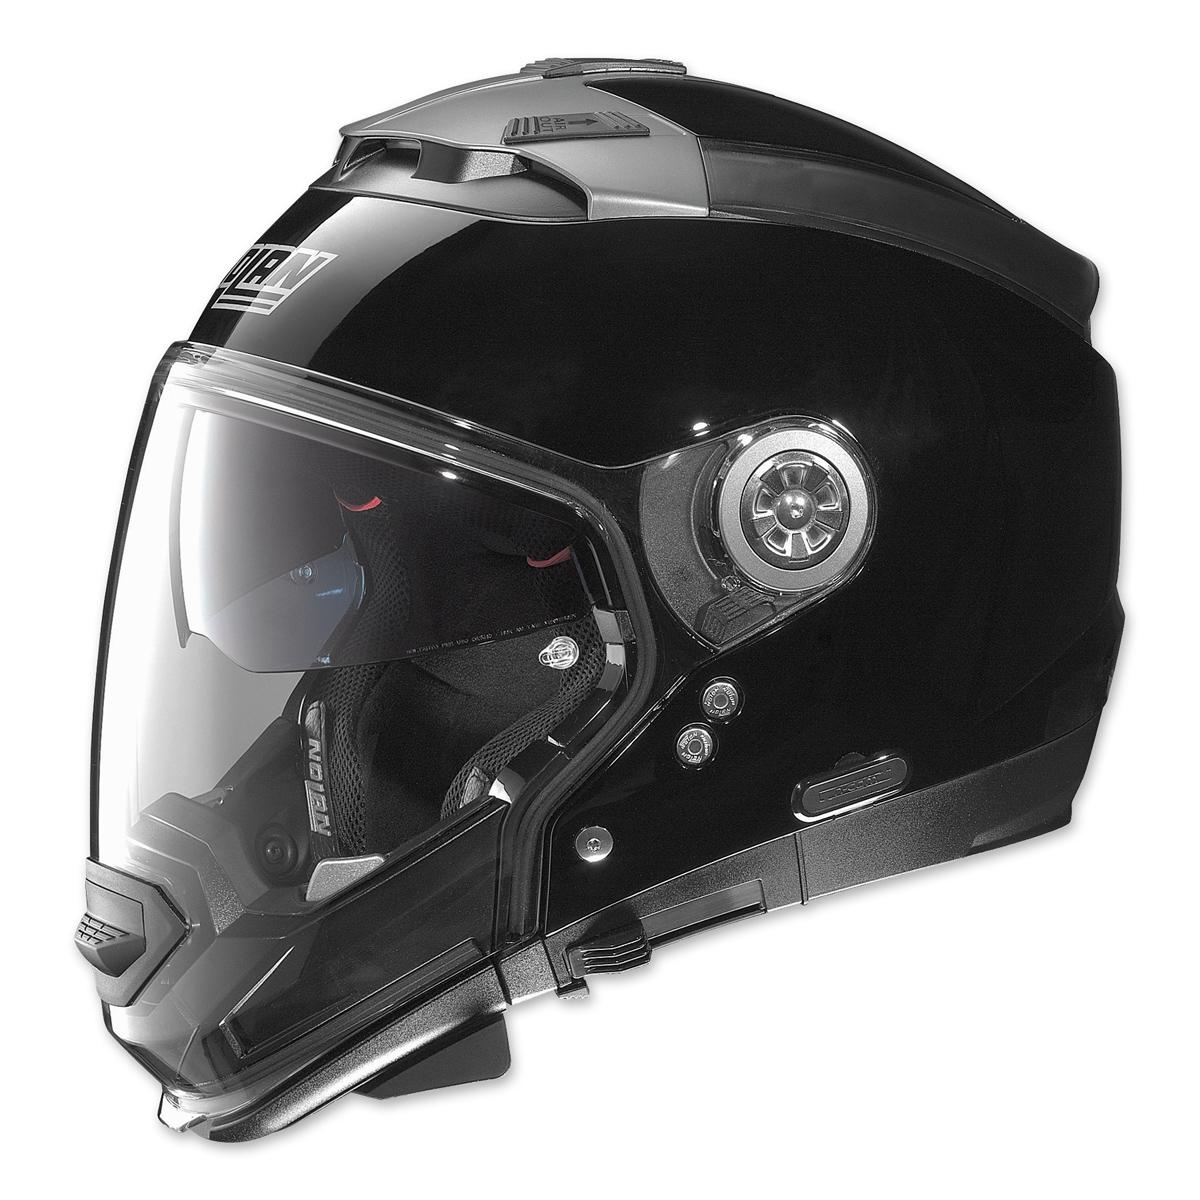 Nolan N44 EVO Gloss Black Modular Helmet